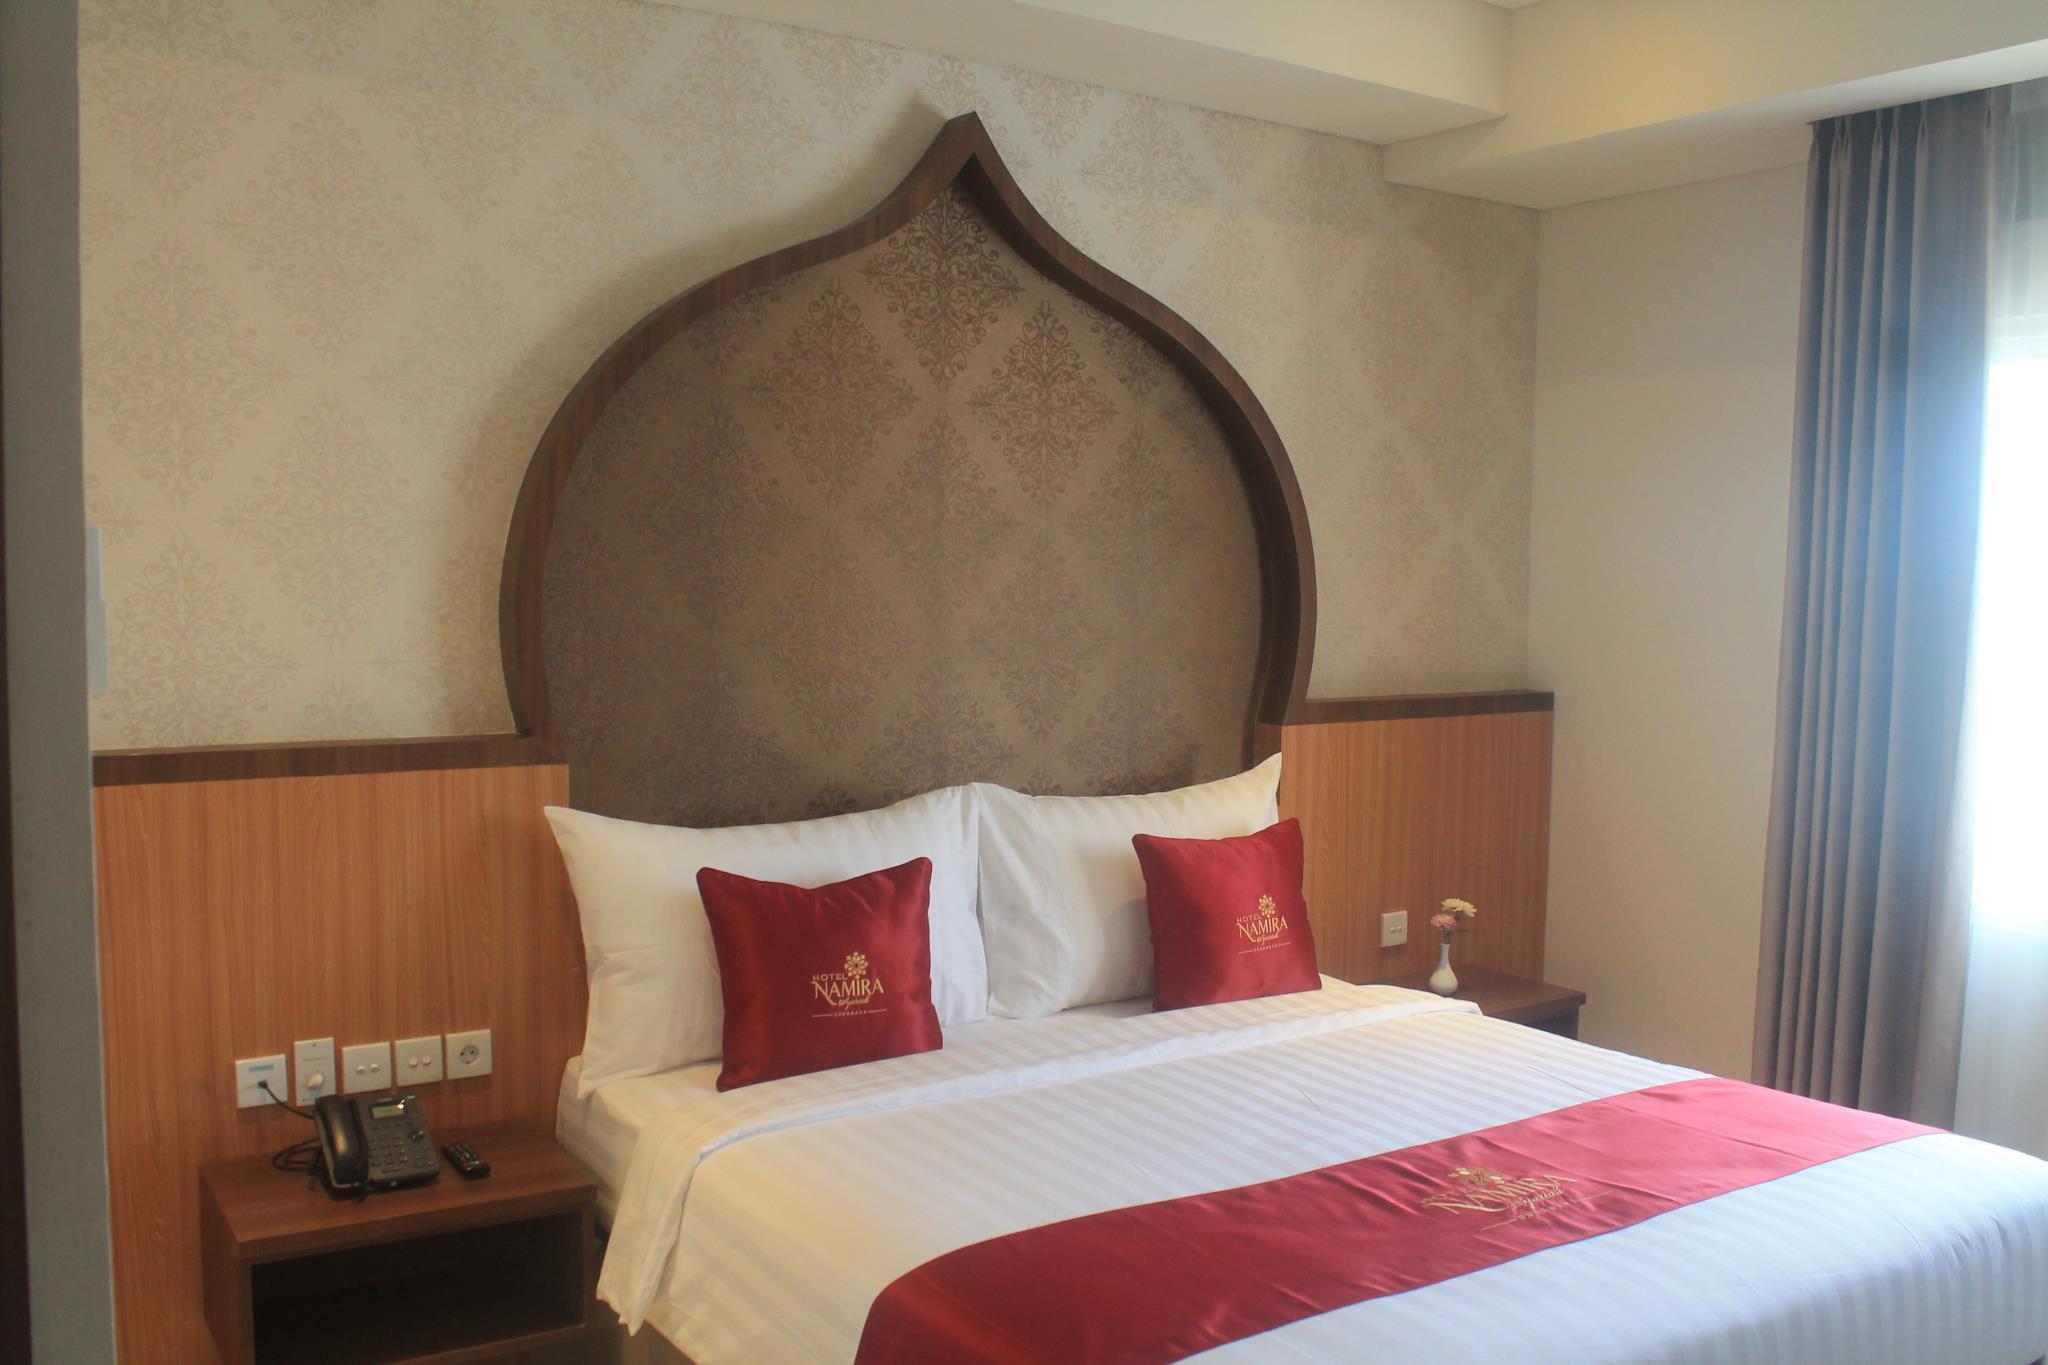 Hotel Namira Syariah Hotel Surabaya - Jln. Wisma Pagesangan 203 Surabaya - Surabaya